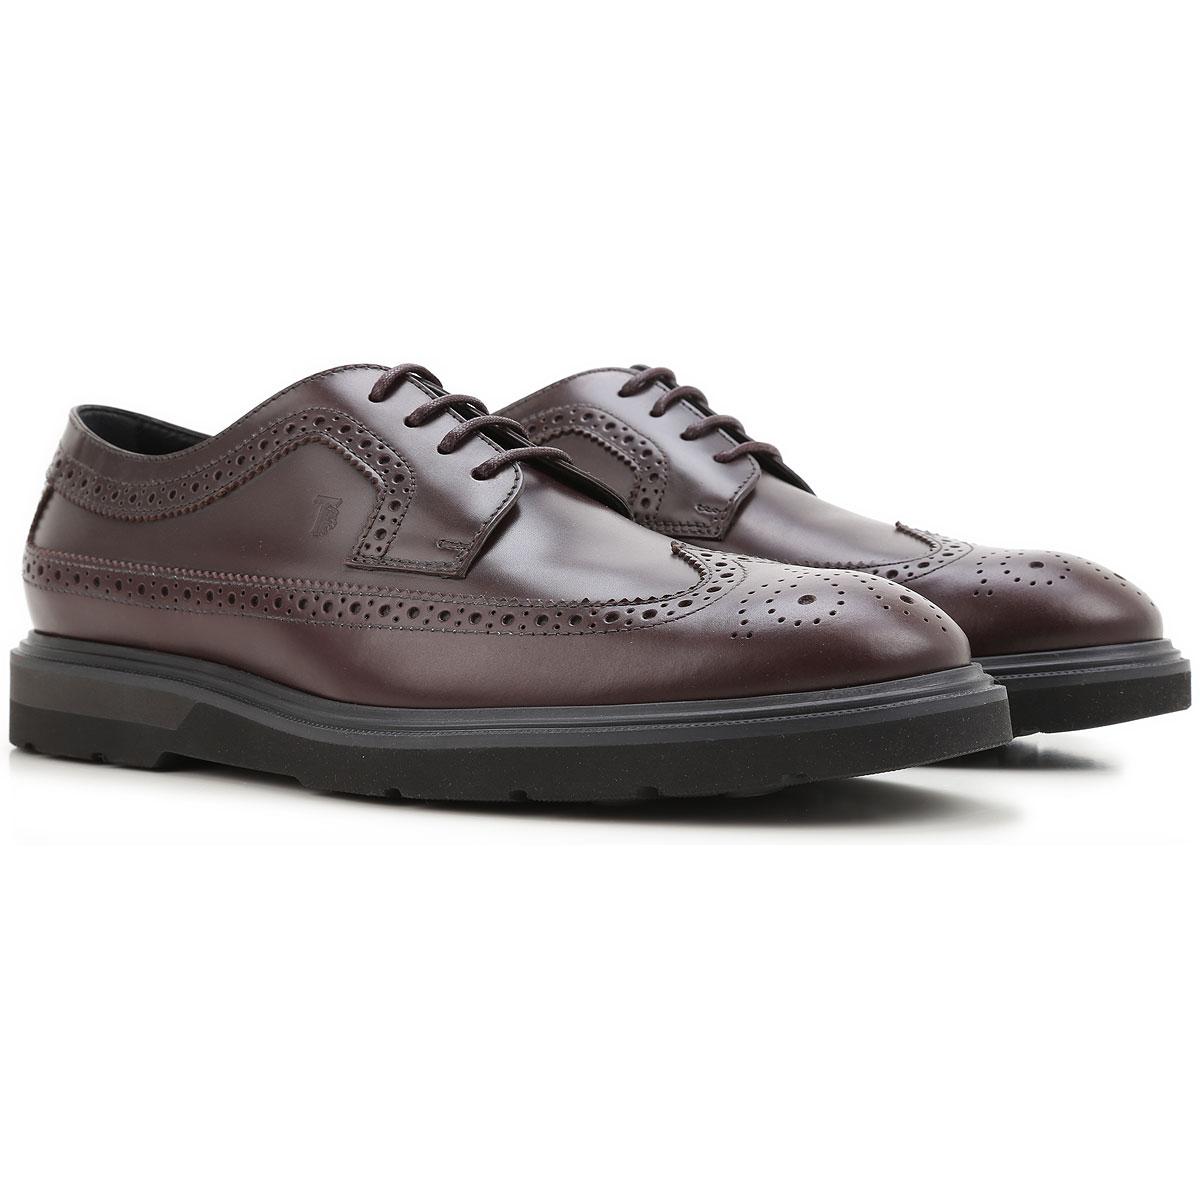 Westwood Mens Shoes